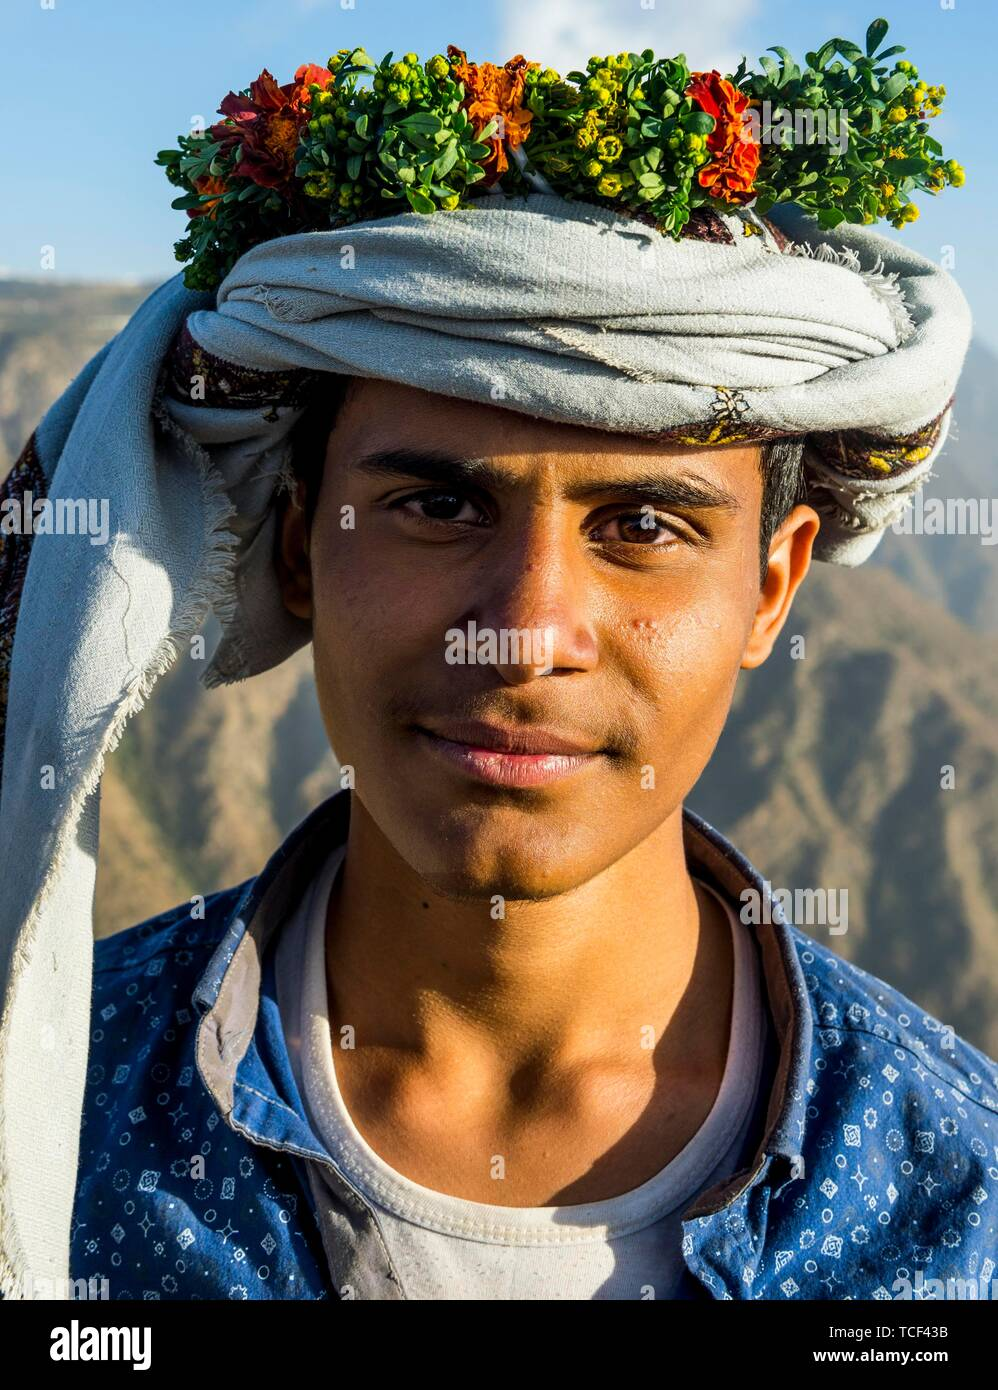 Abha Saudi Arabia High Resolution Stock Photography And Images Alamy